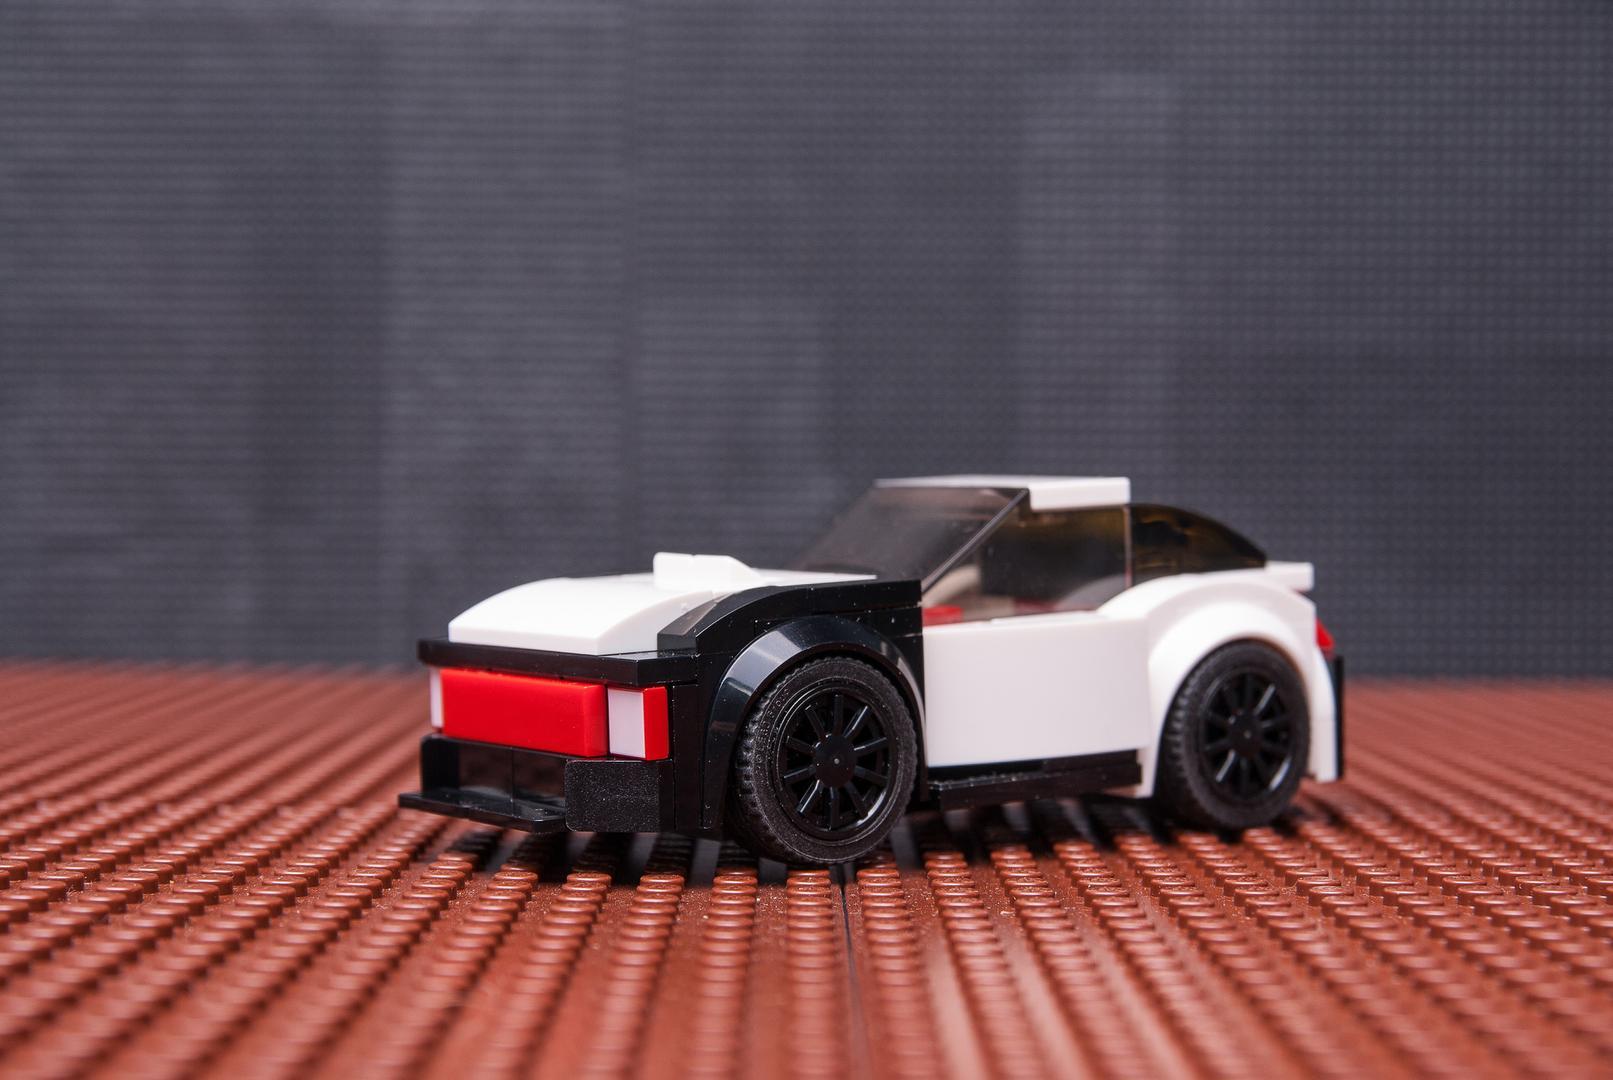 Lego Moc 8517 75873 Drift Car Speed Champions 2017